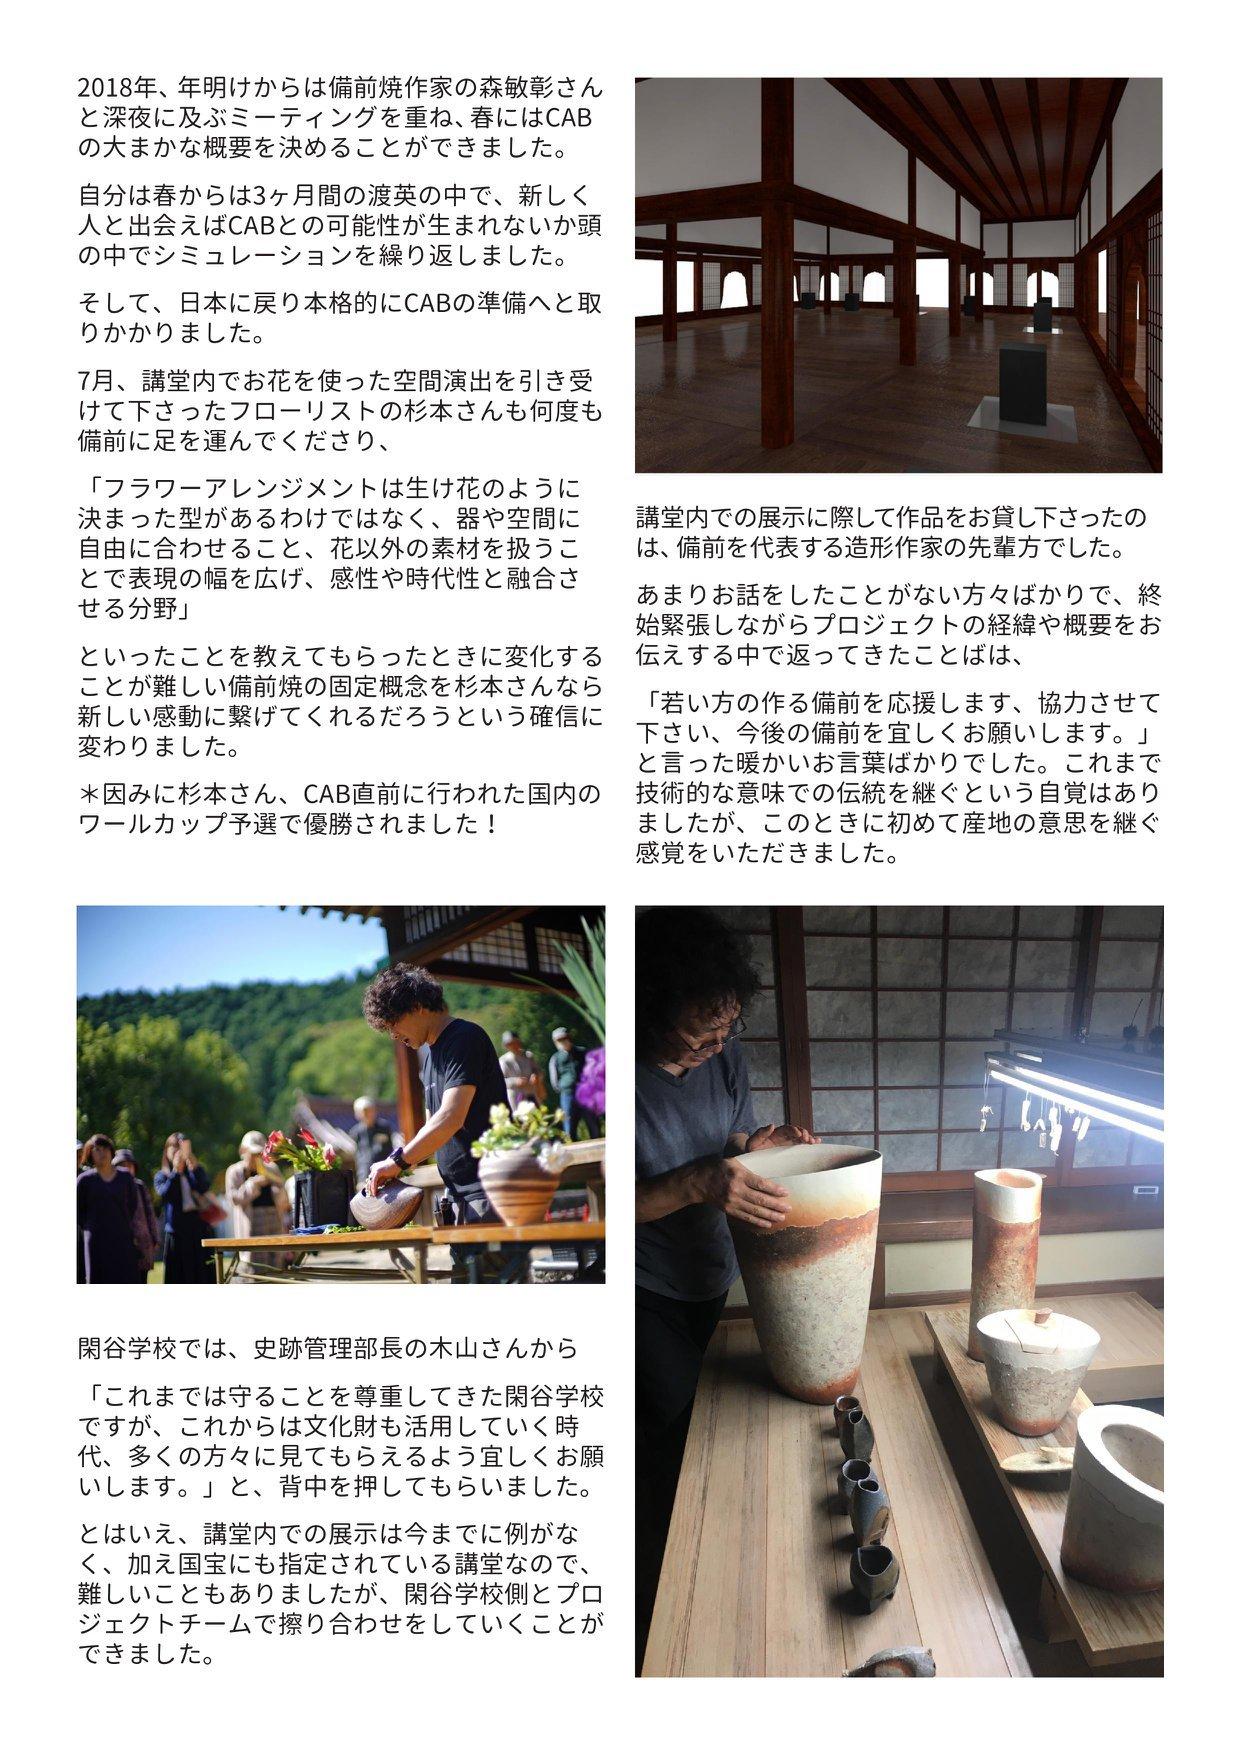 Ceramic Art Bizen in Shizutani 終了しました_d0229351_20565805.jpg